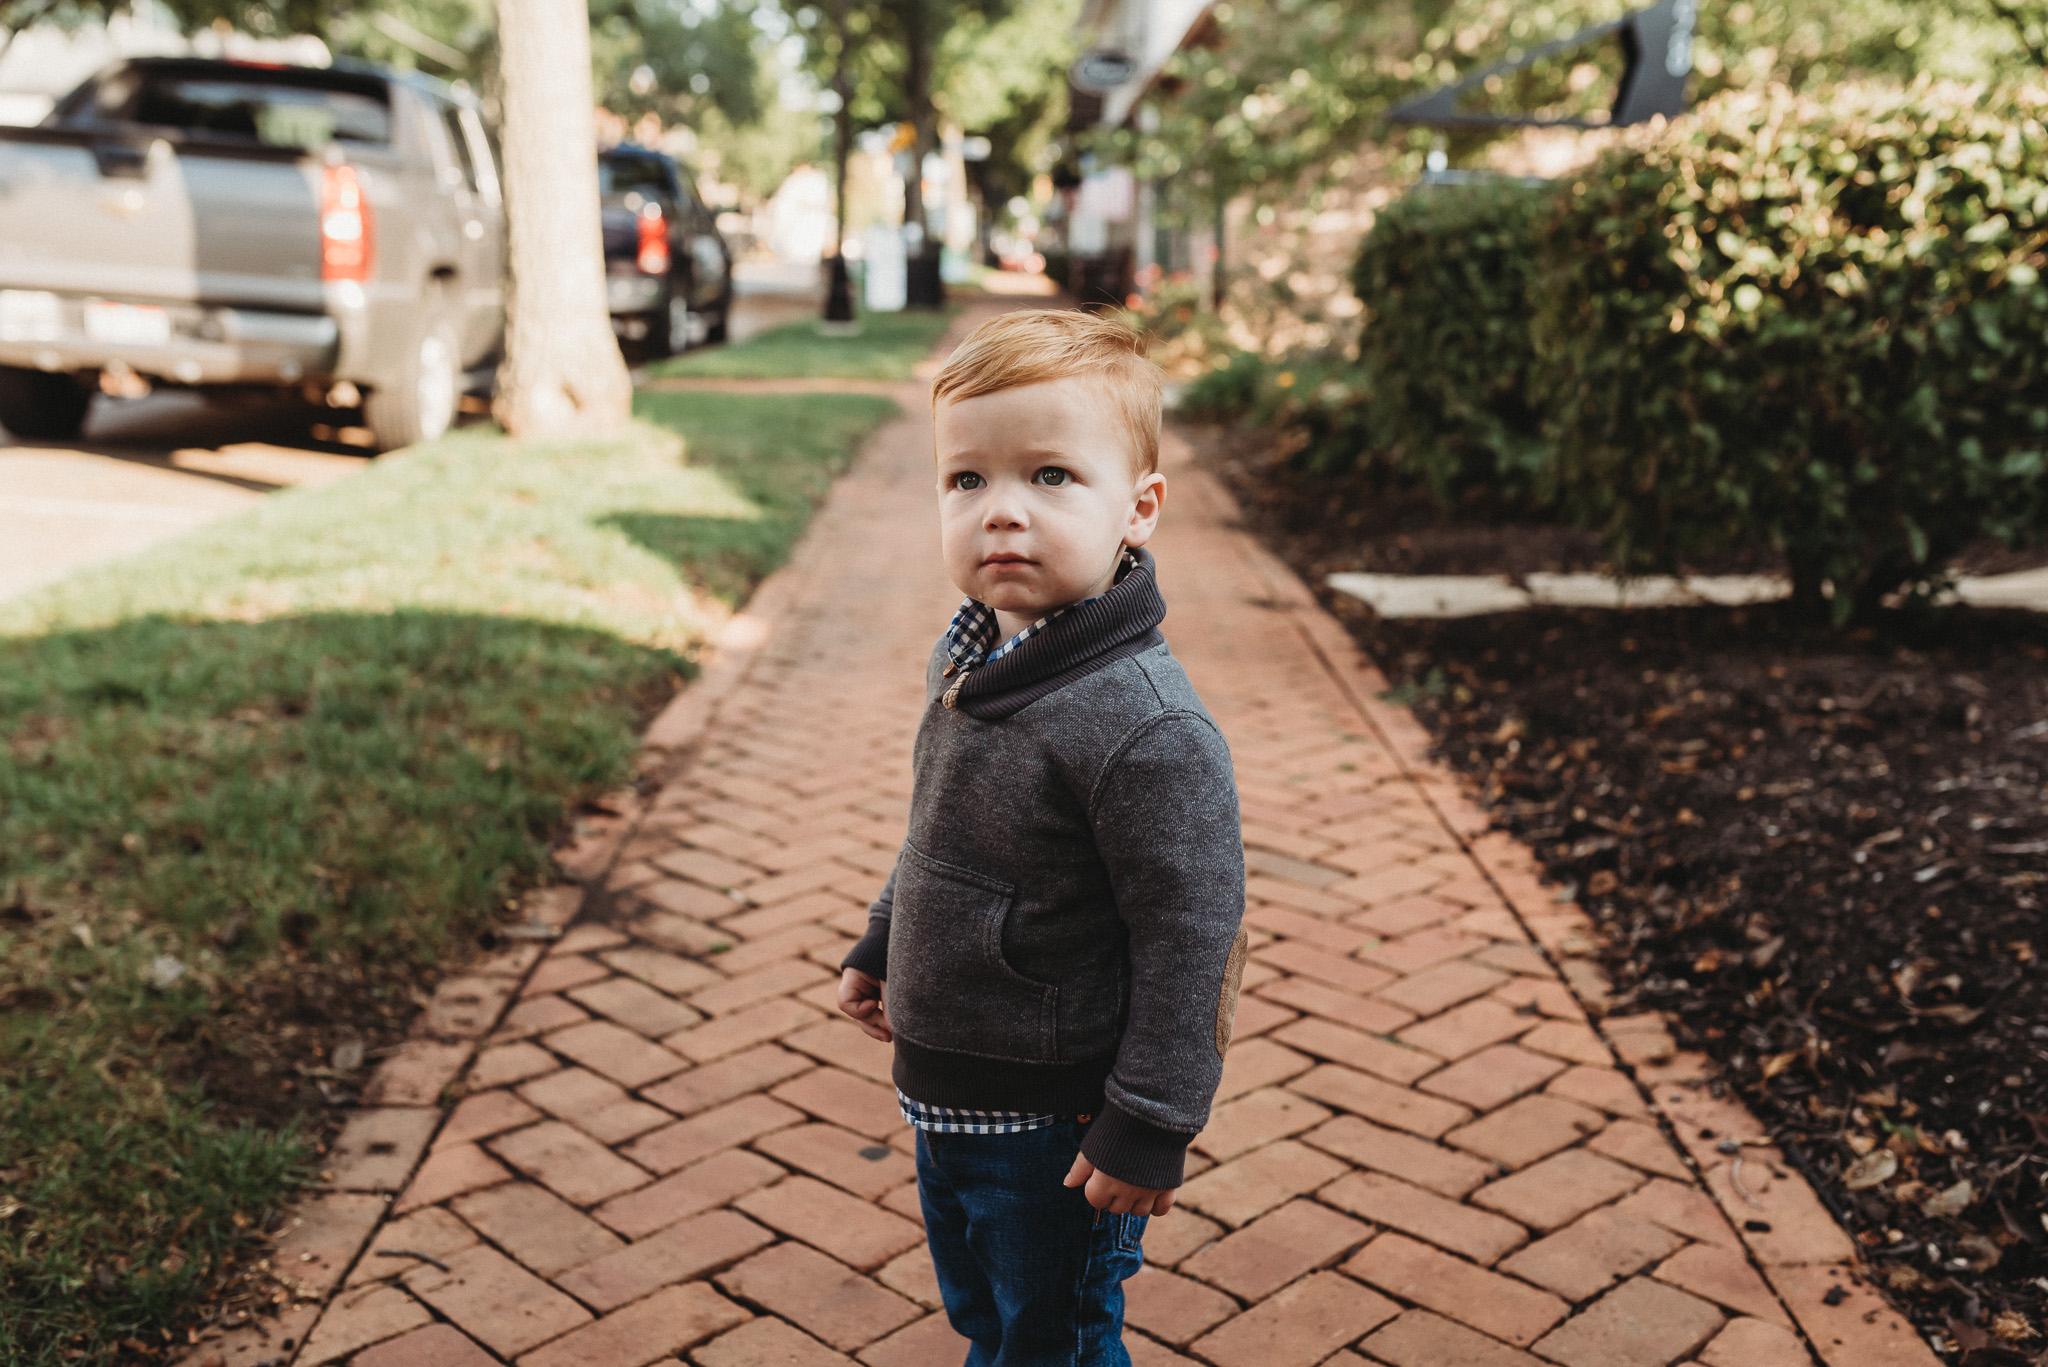 Downtown-Dublin-Ohio-Family-Photos-Erika-Venci-Photography